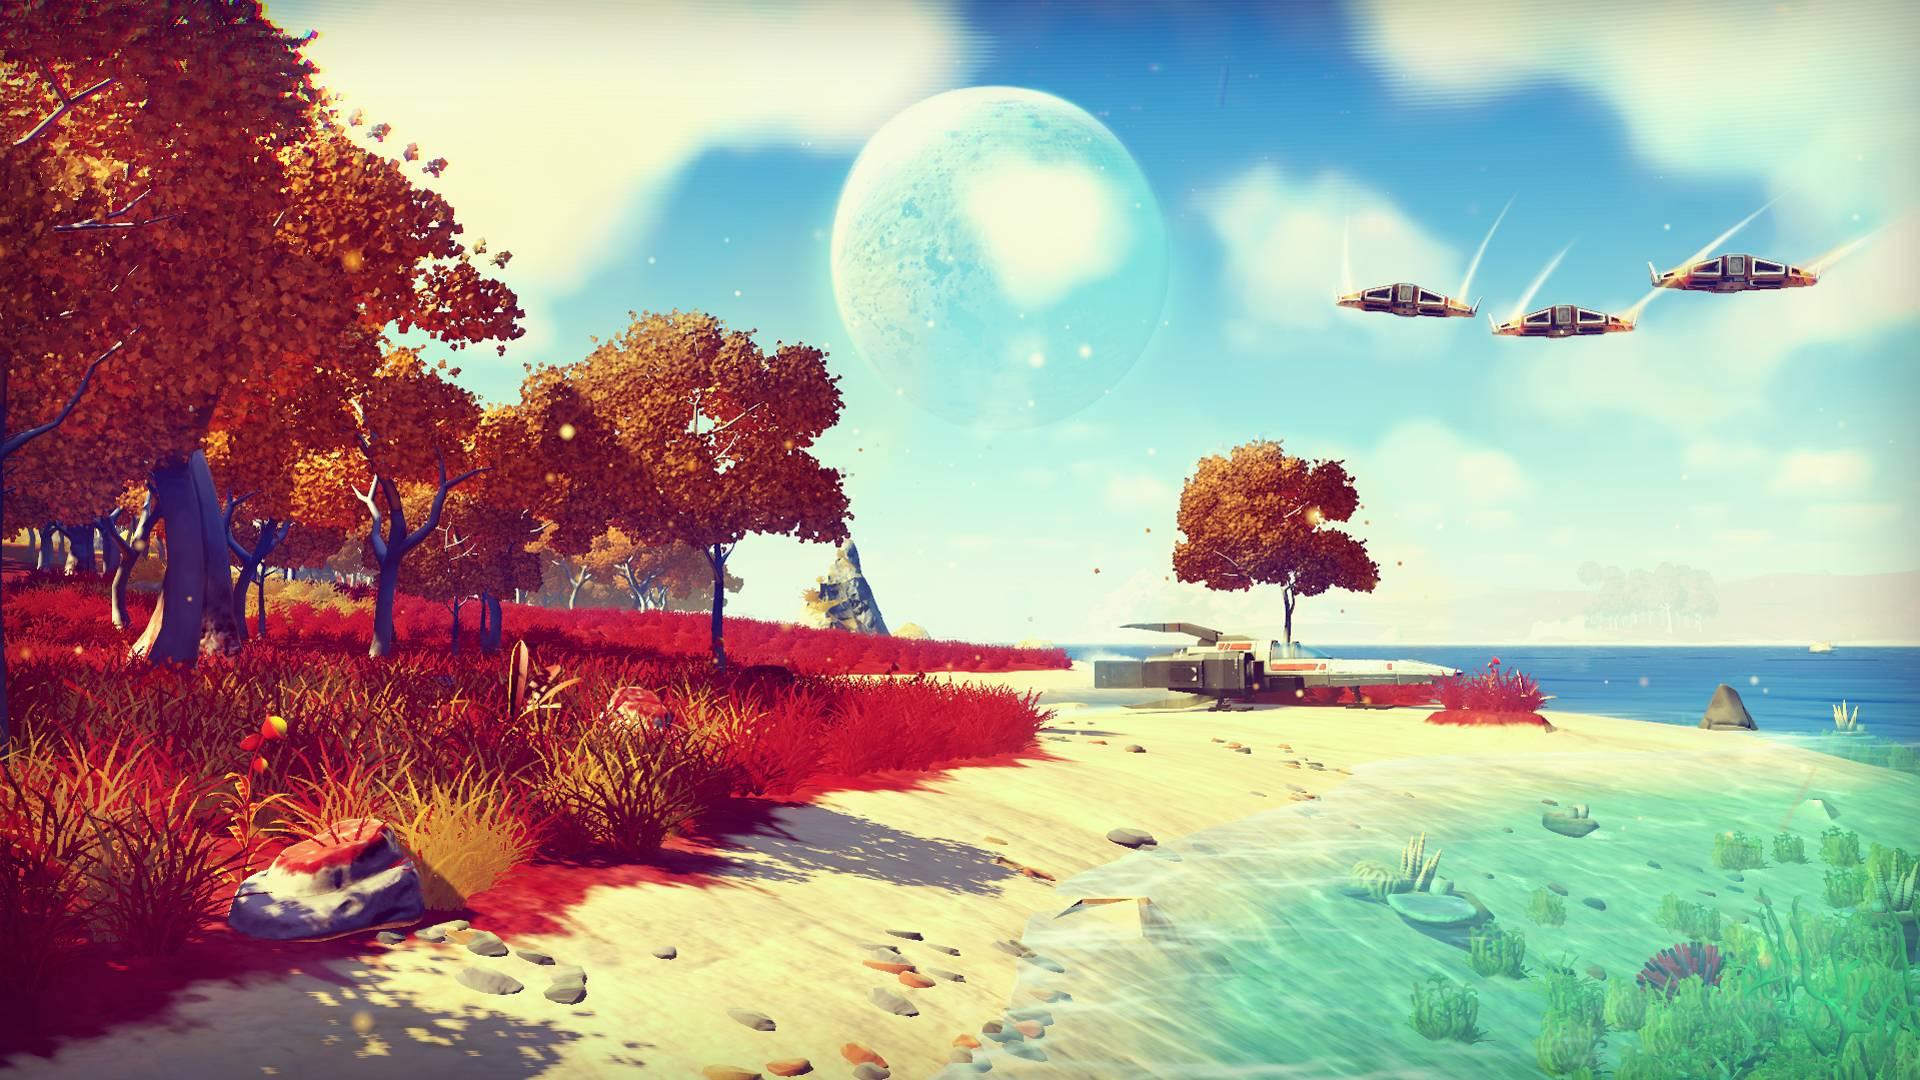 No Man's Sky: Visions Erweiterung bringt neuen Content!